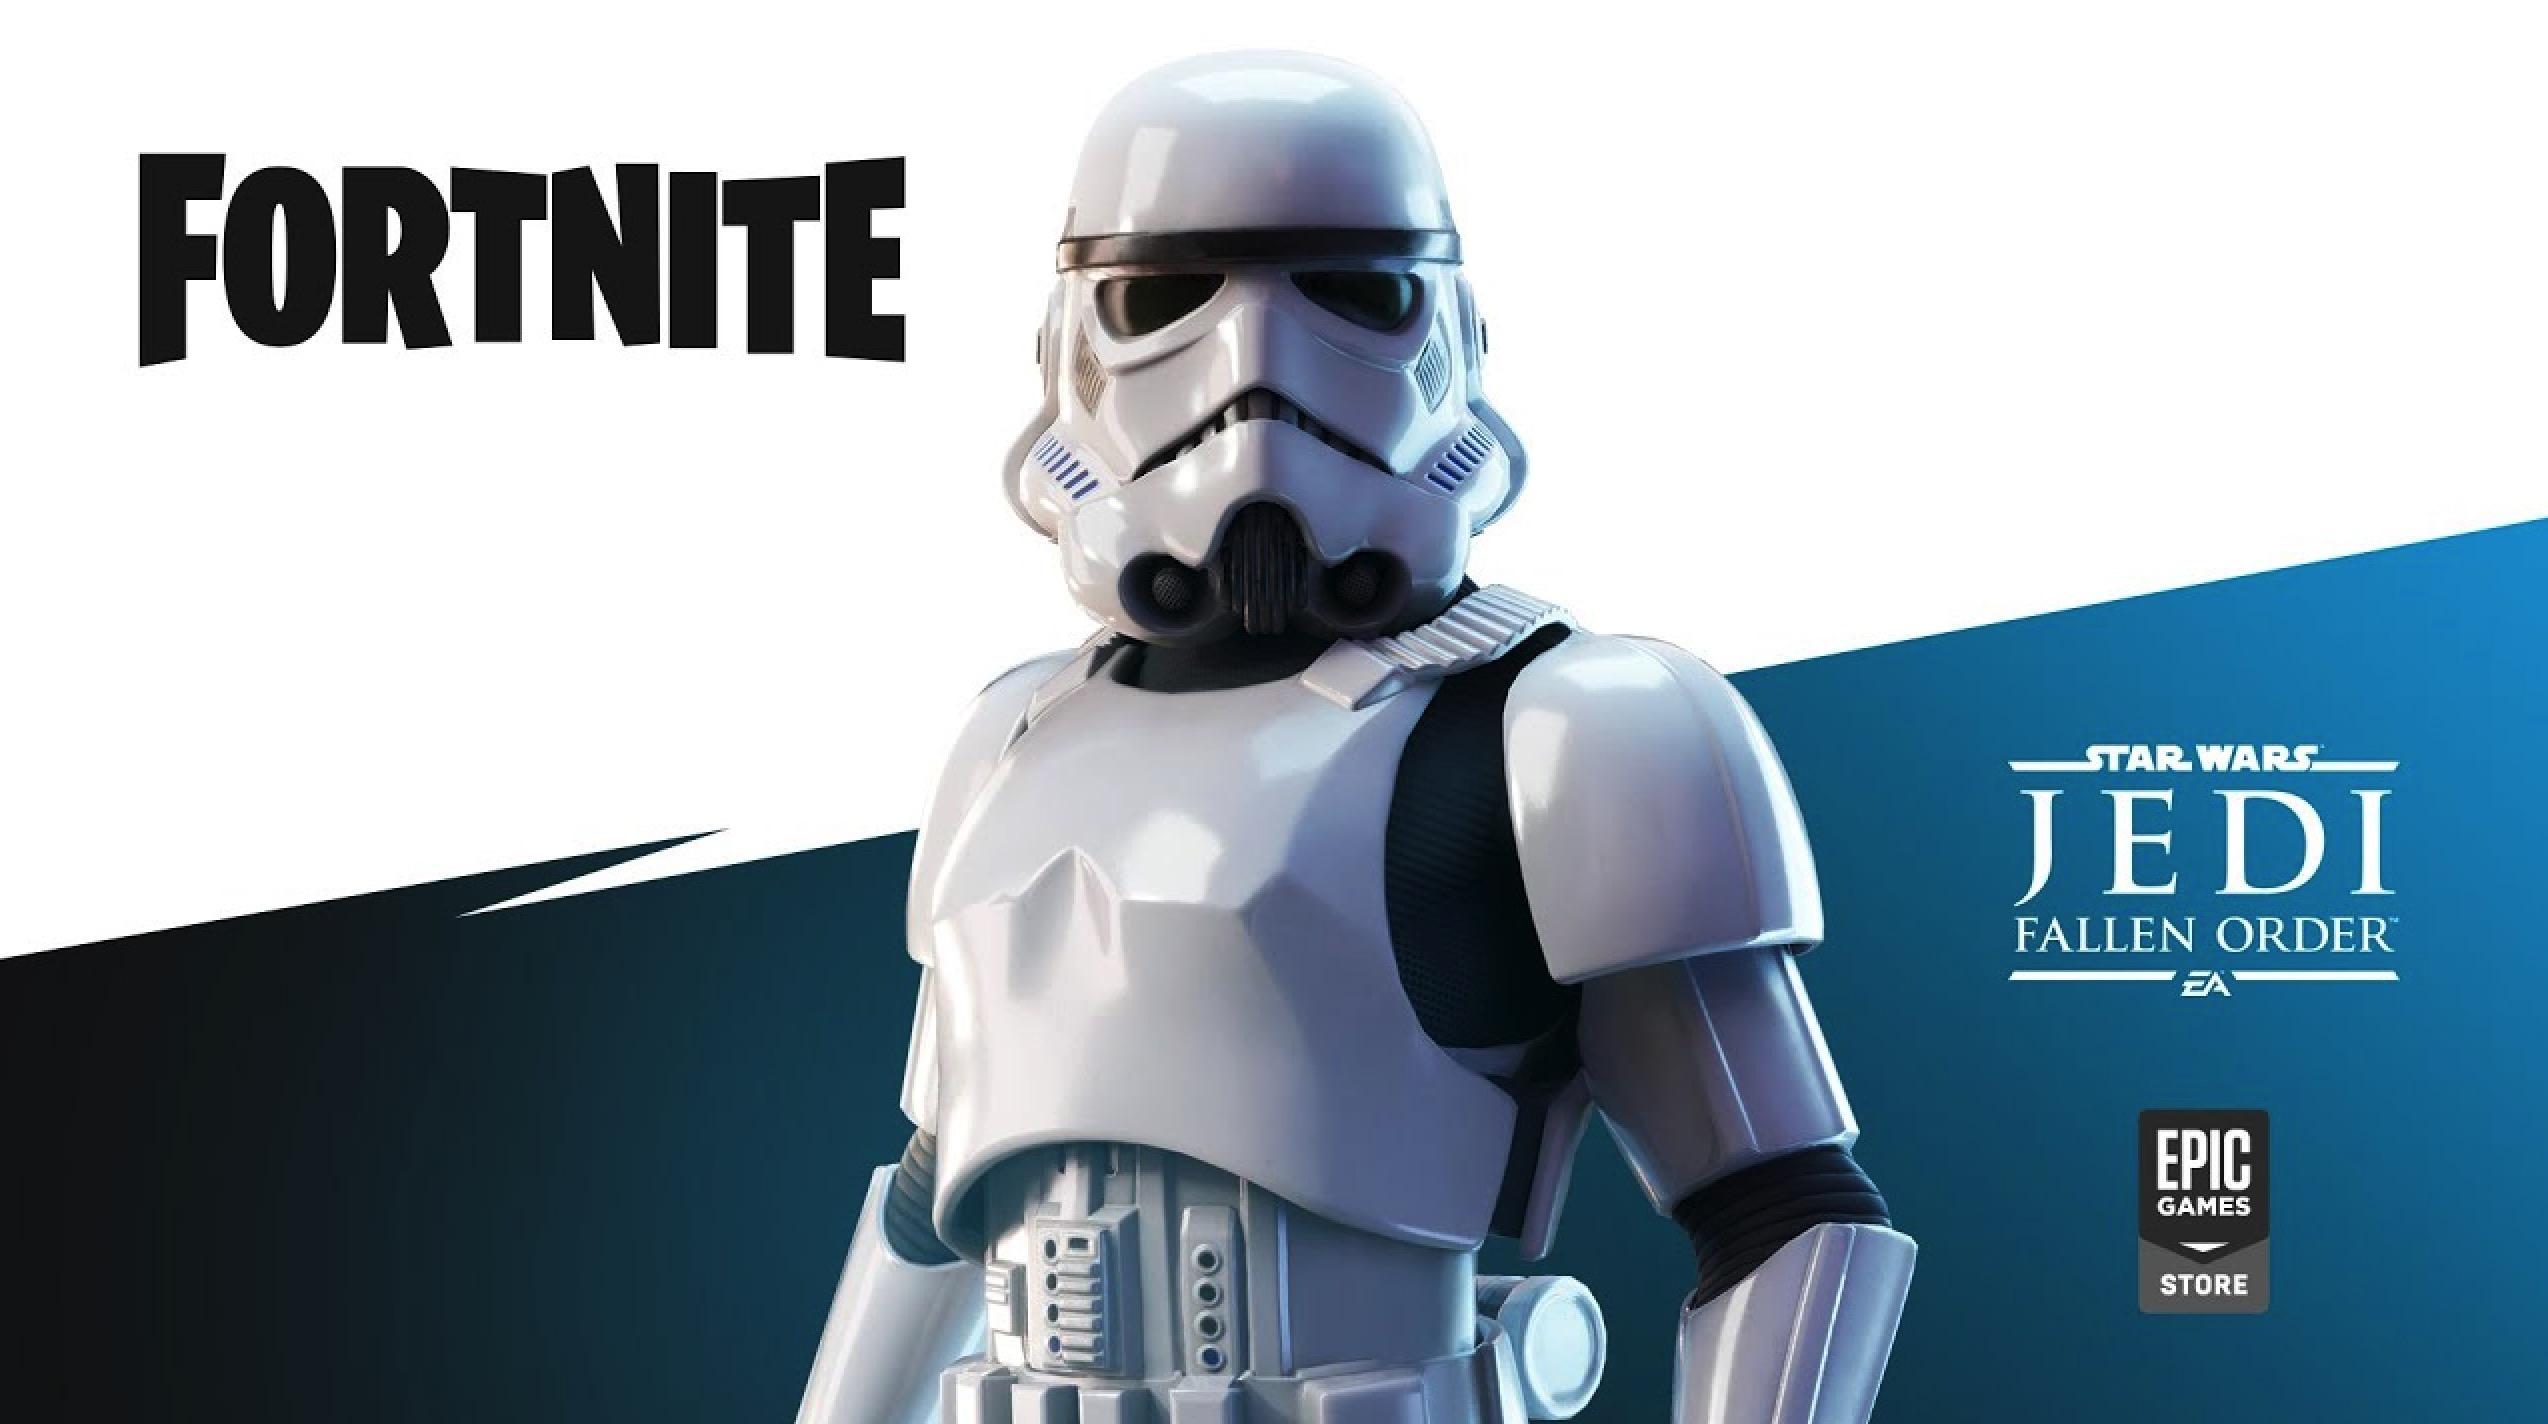 fortnite starwars 364x205 - Fortnite is getting a Star Wars crossover with Jedi: Fallen Order